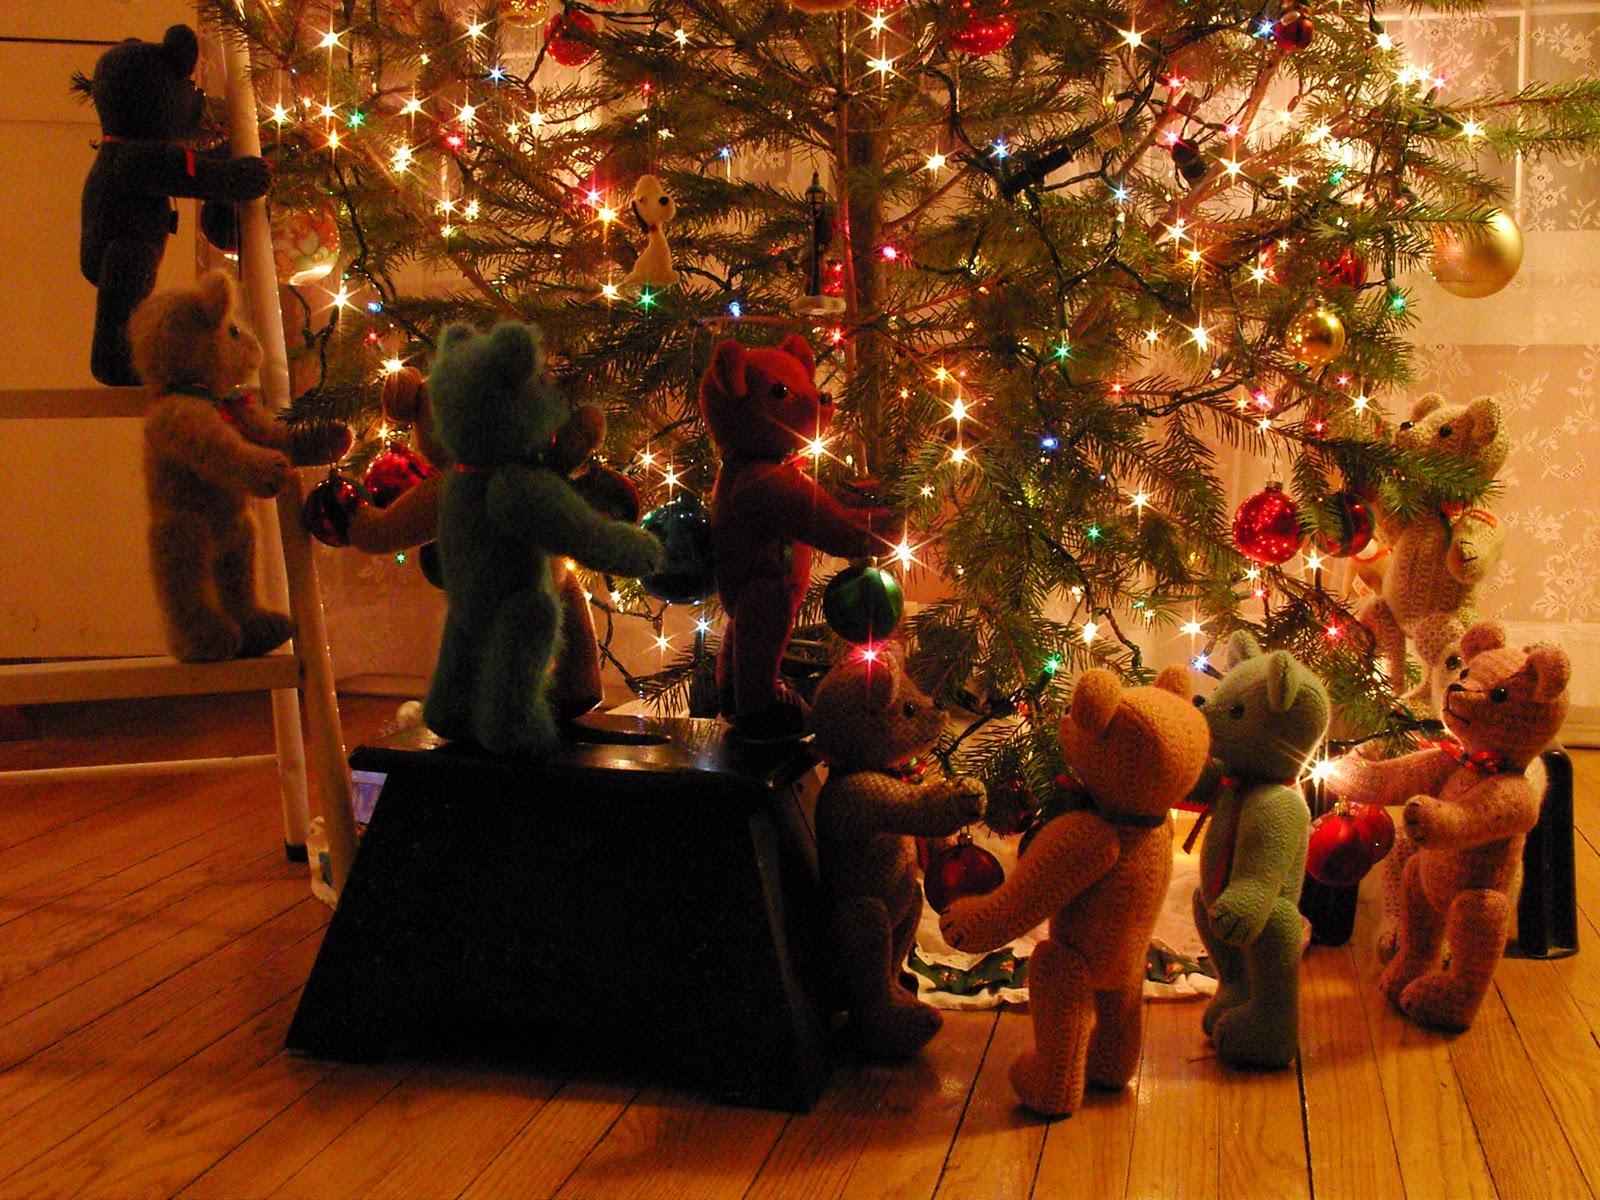 teddy bears help decorate the christmas tree